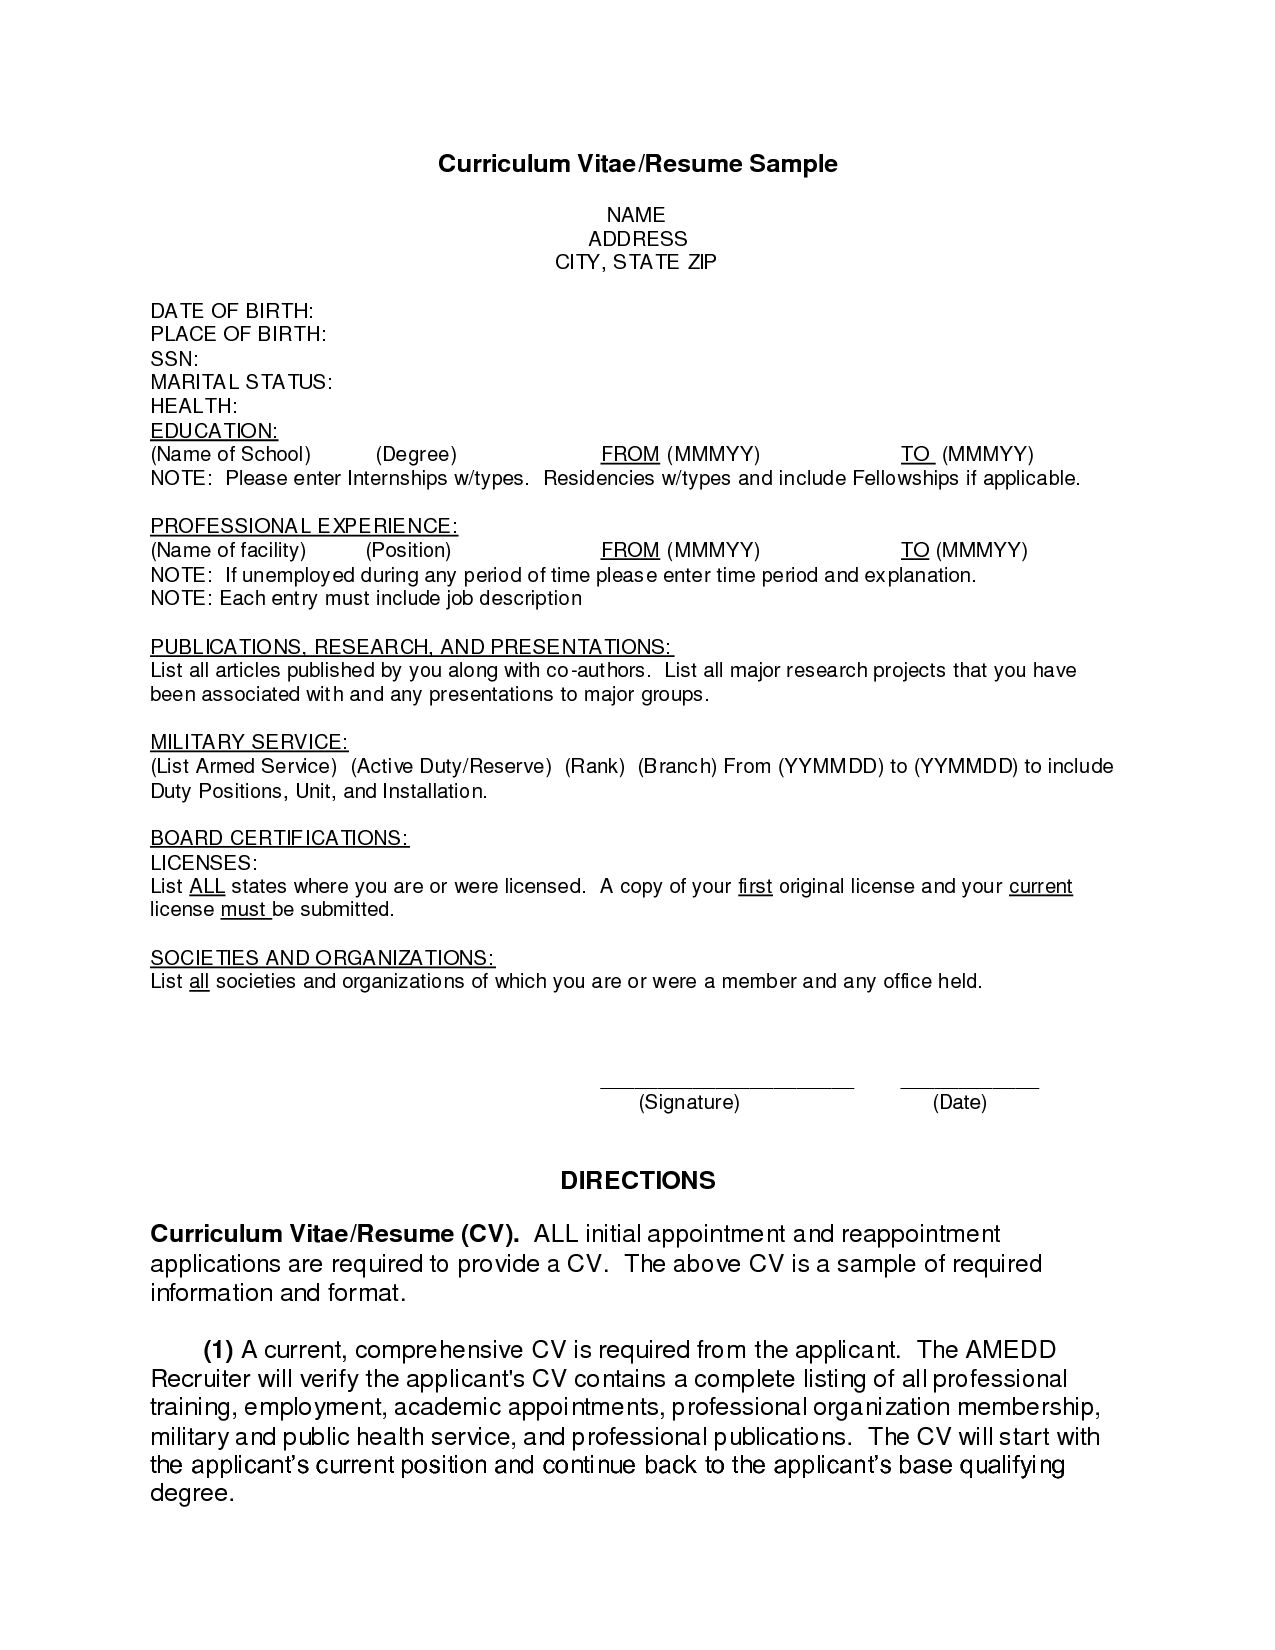 Resume Worksheet For Middle School Students